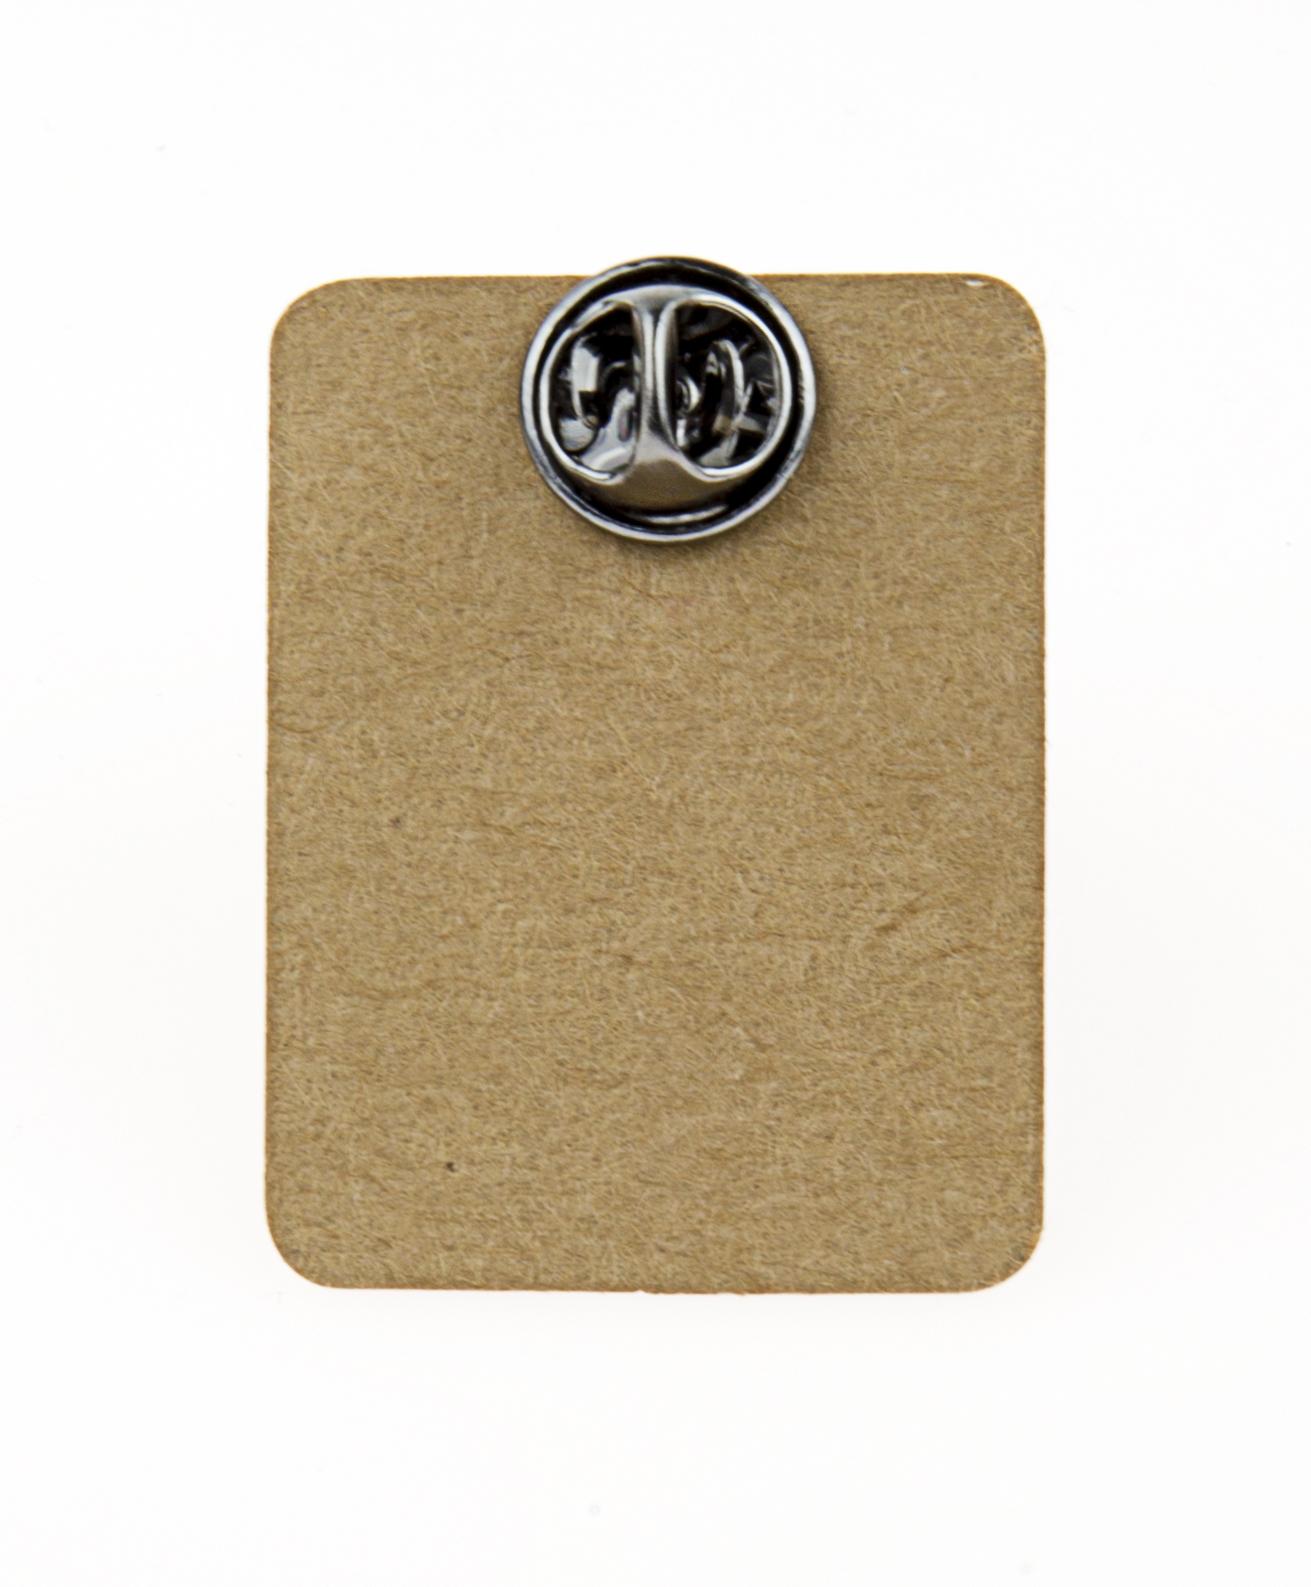 Metal Jar space Enamel Pin Badge